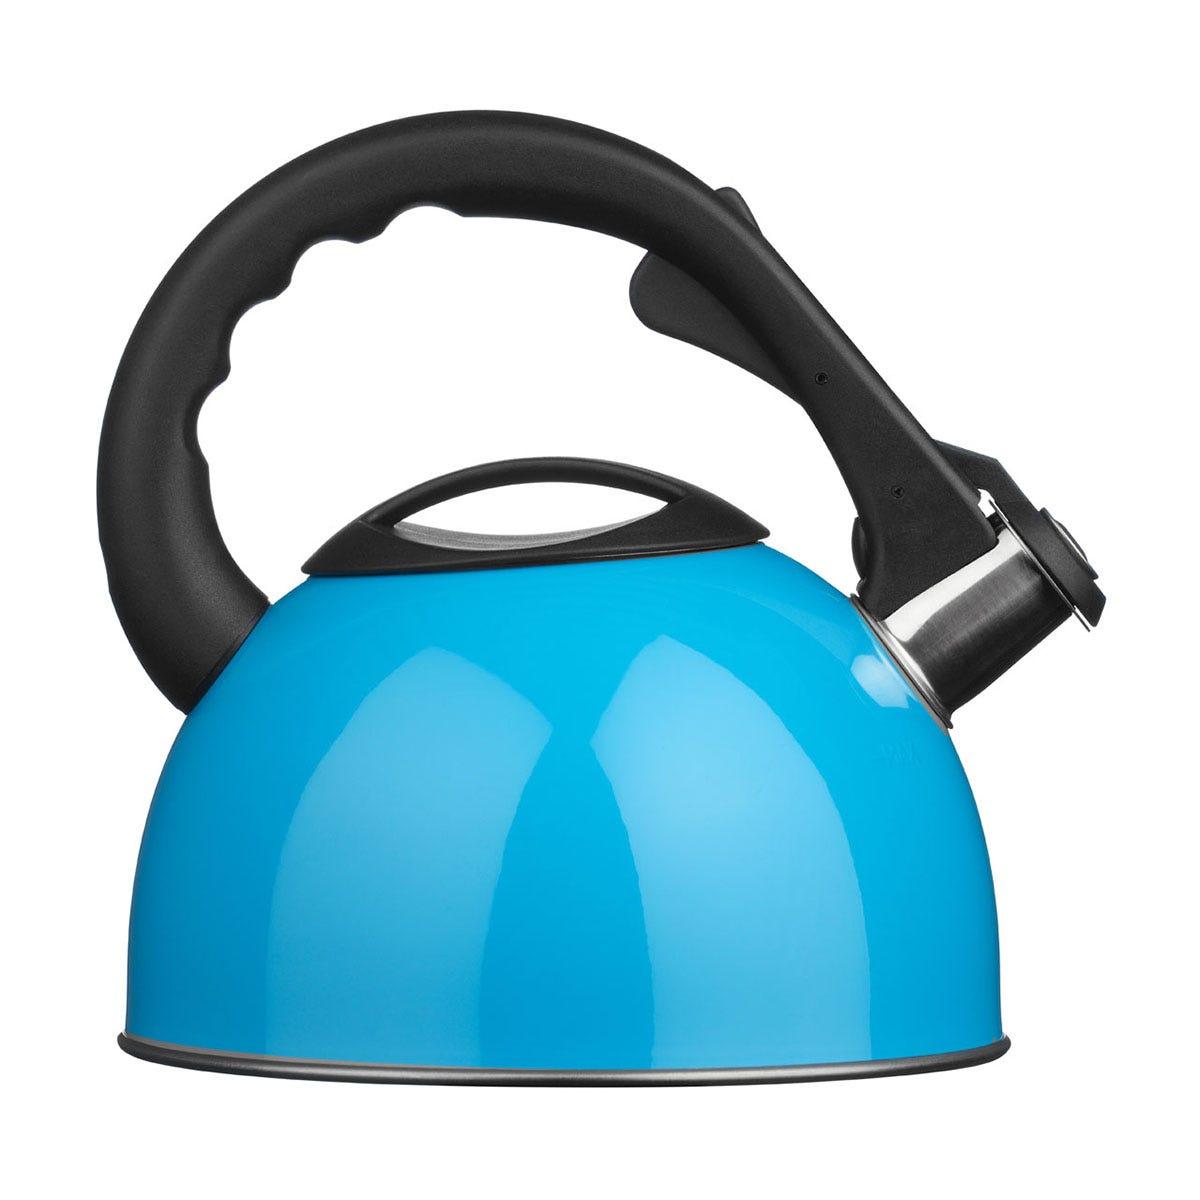 Premier Housewares 2.5L Stainless Steel Whistling Kettle - Blue